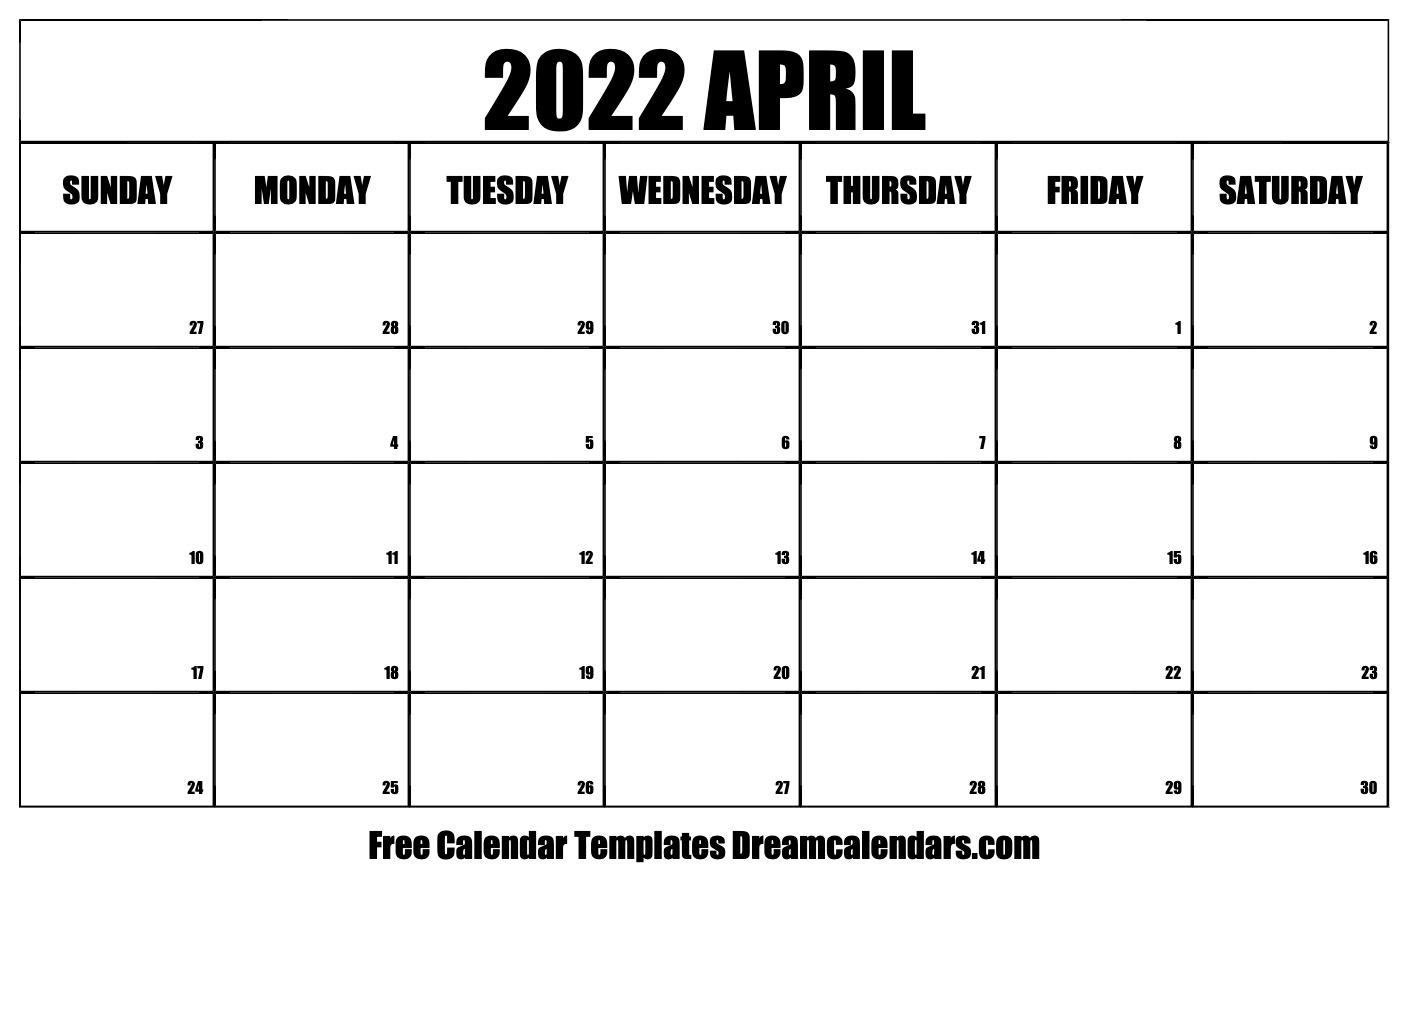 April 2022 Calendar | Free Blank Printable Templates Intended For March April 2022 Calendar Print